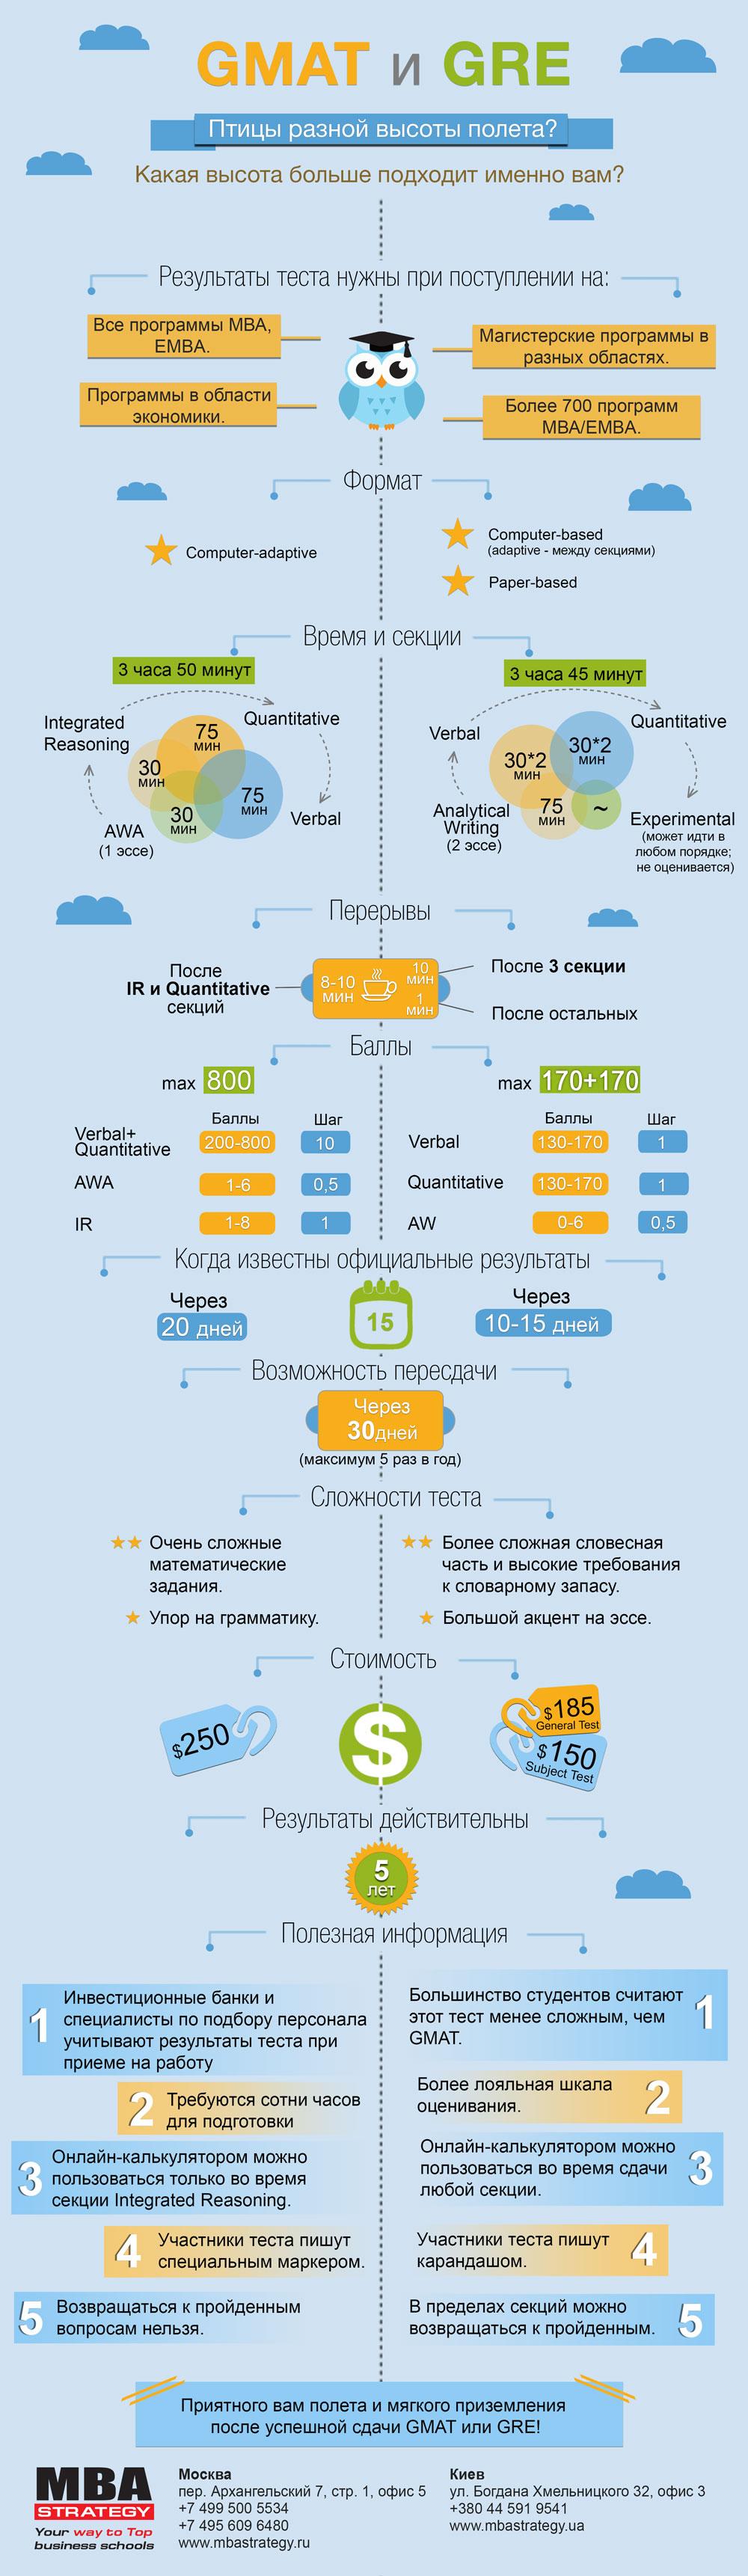 GMAT_GRE_инфографика